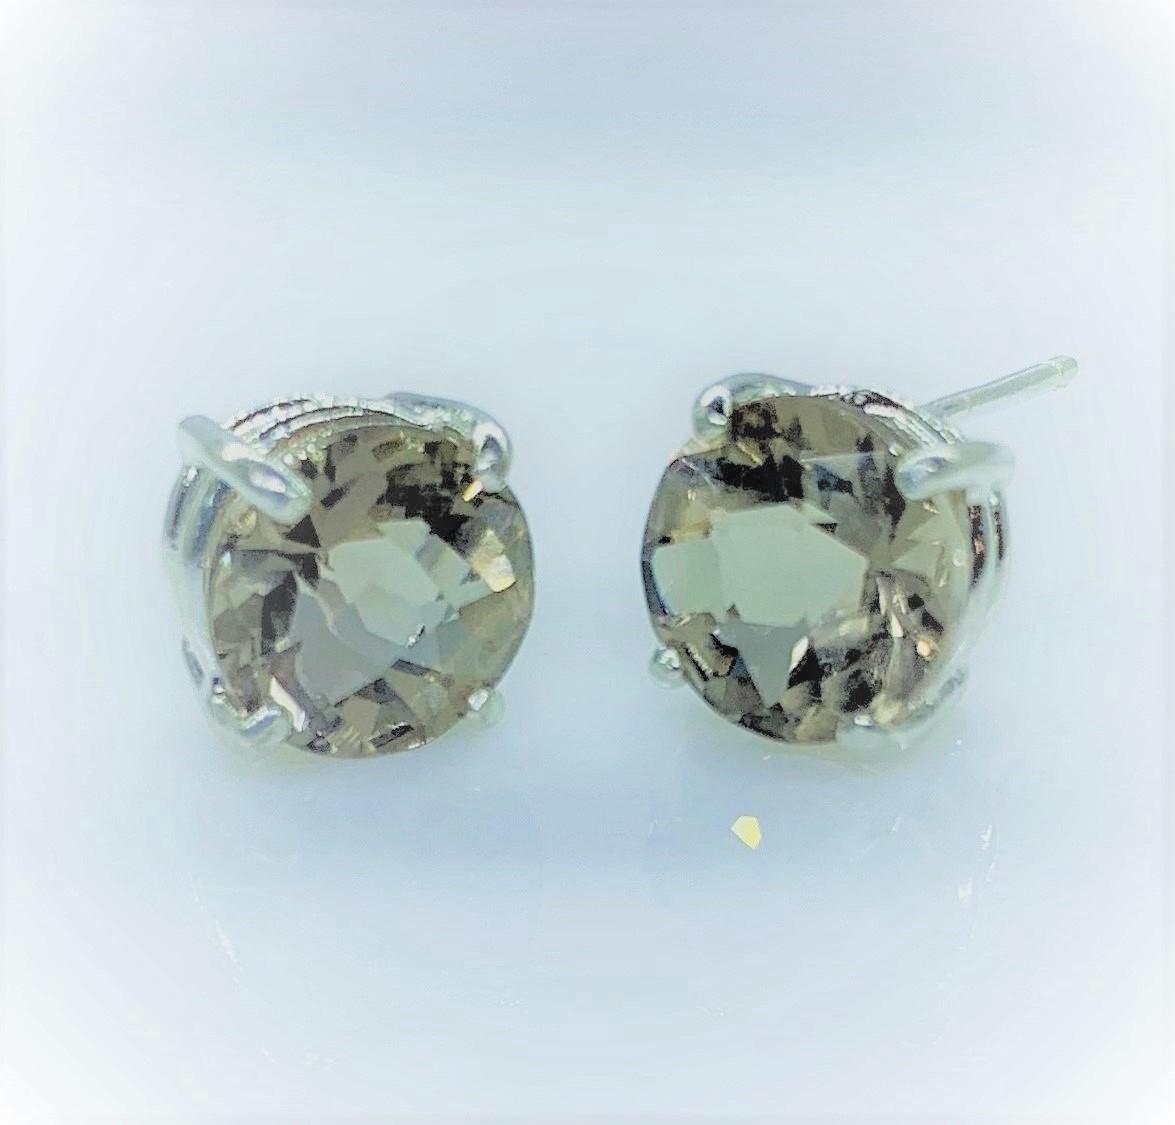 8mm Faceted Rock Quartz Gemstone Post Earrings set in Sterling Silver